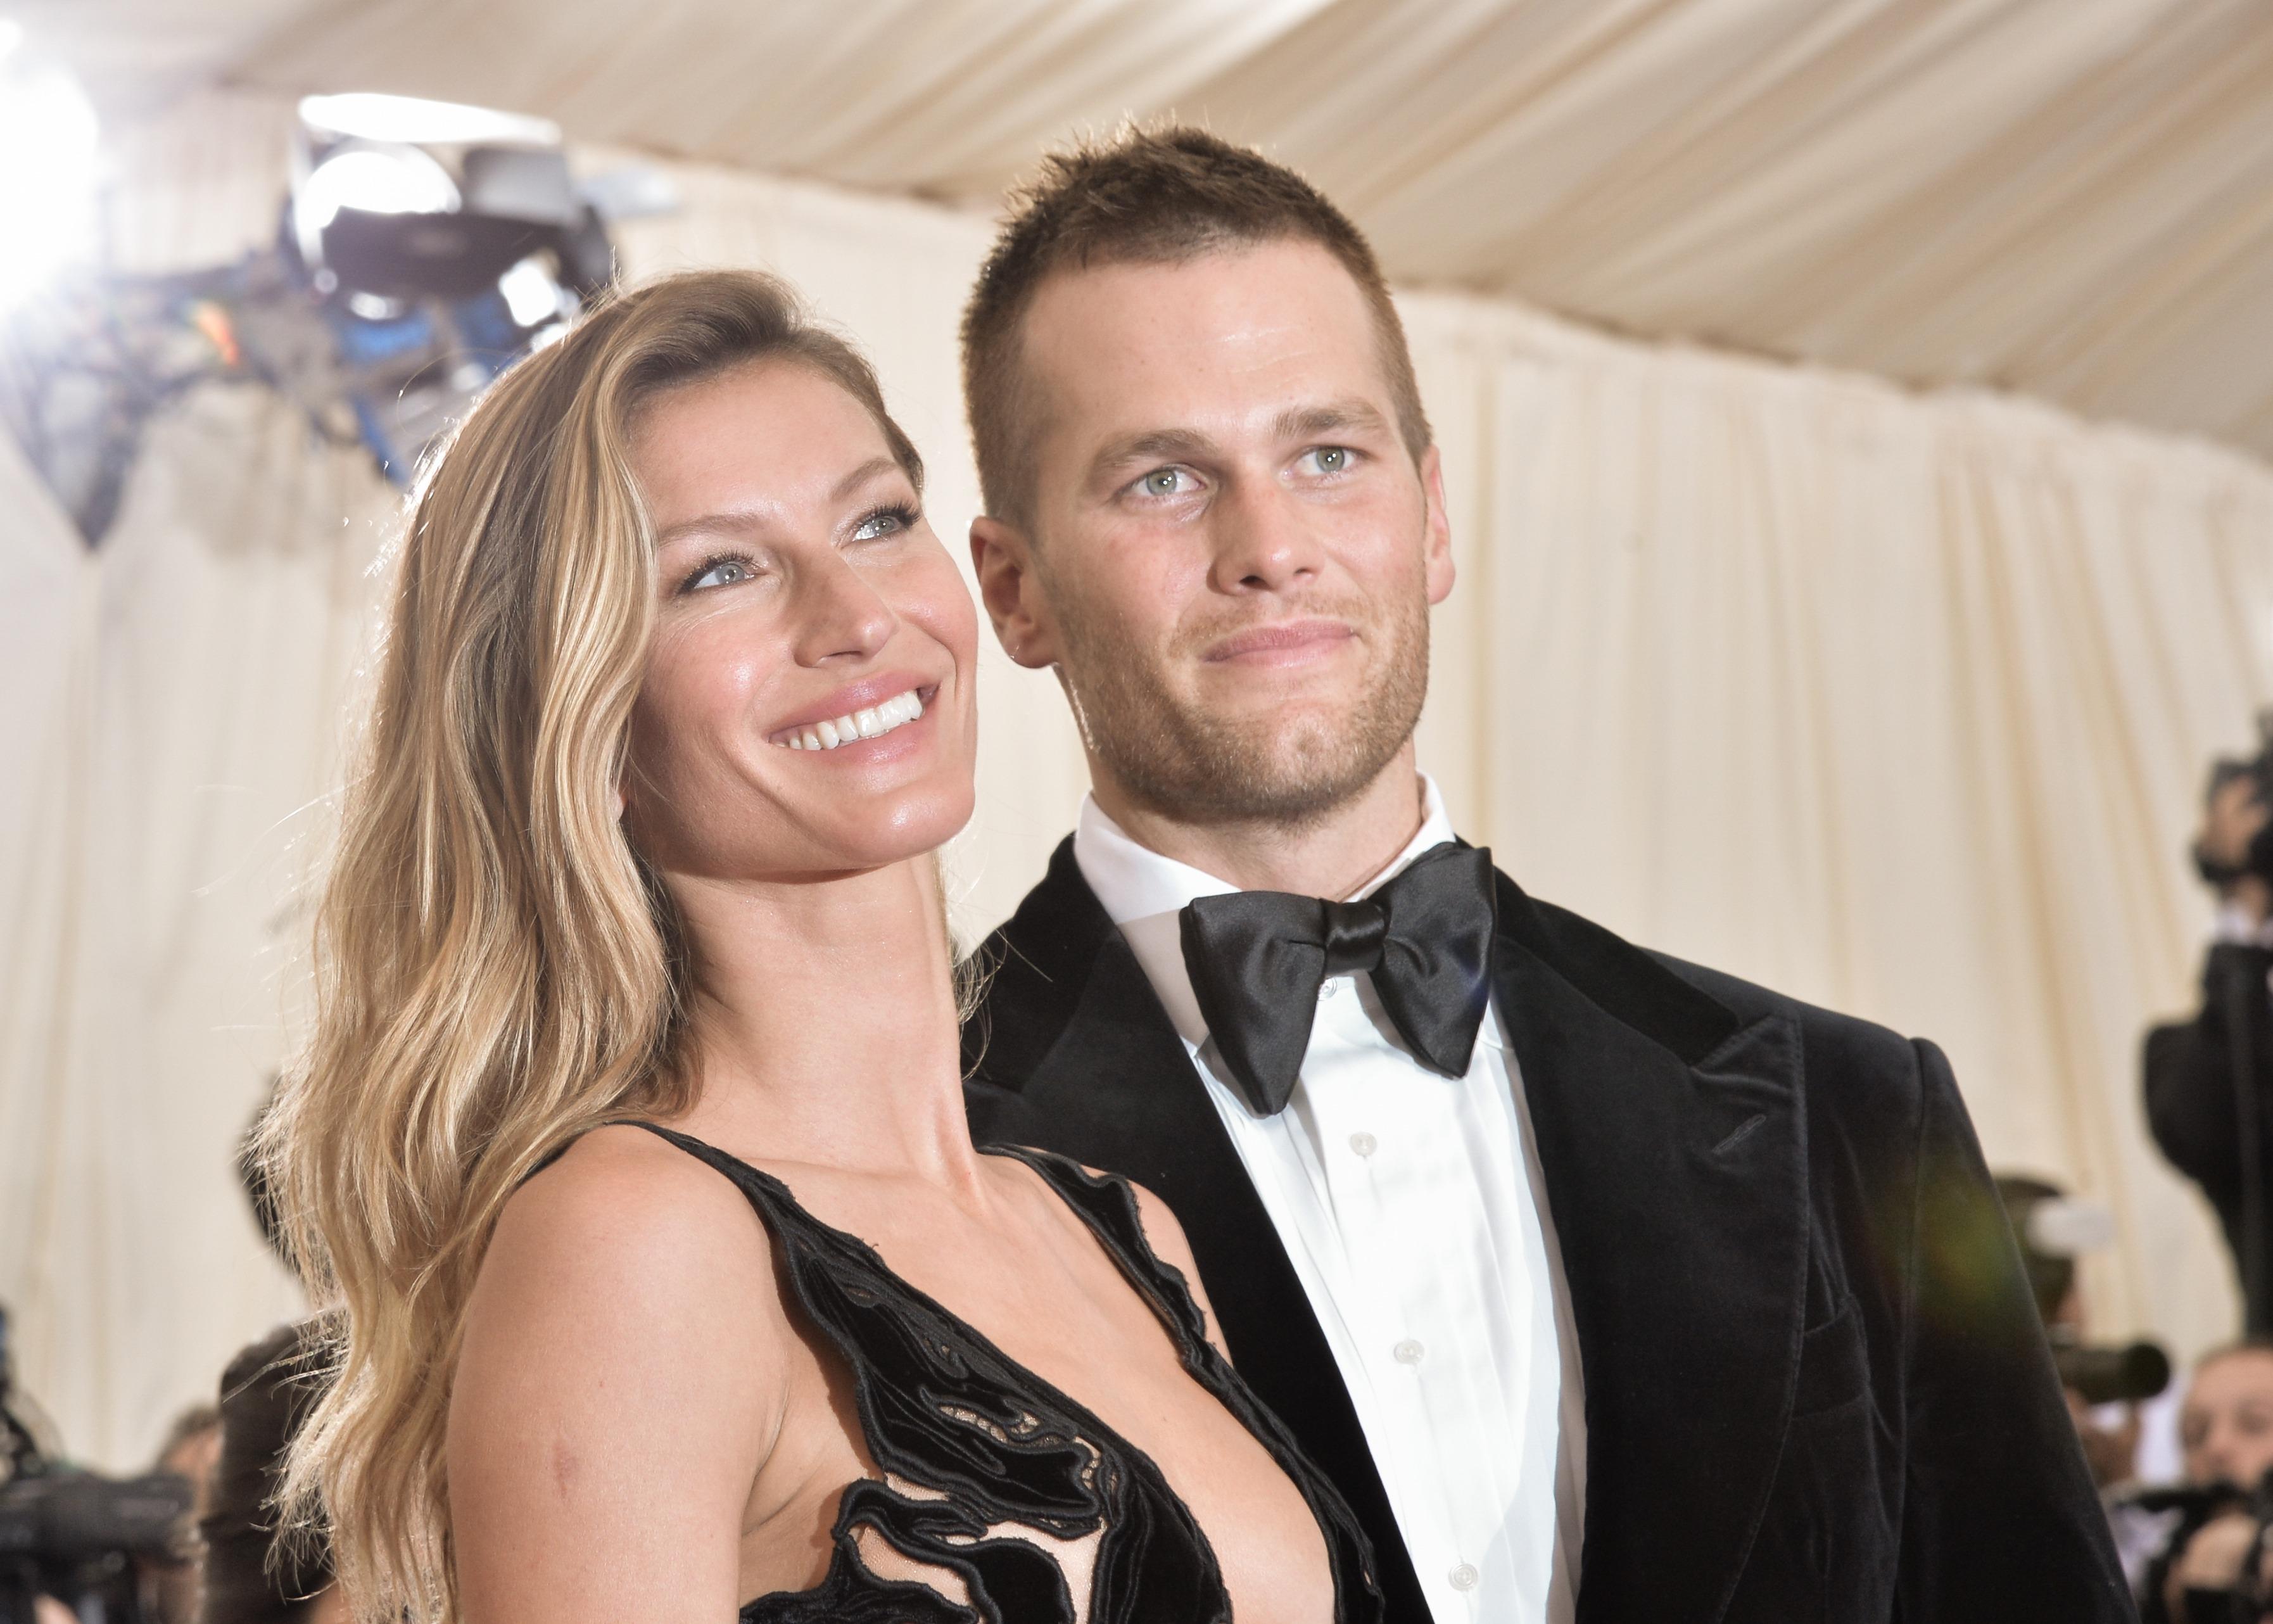 New England Patriots quarterback Tom Brady and his wife Gisele Bundchen.